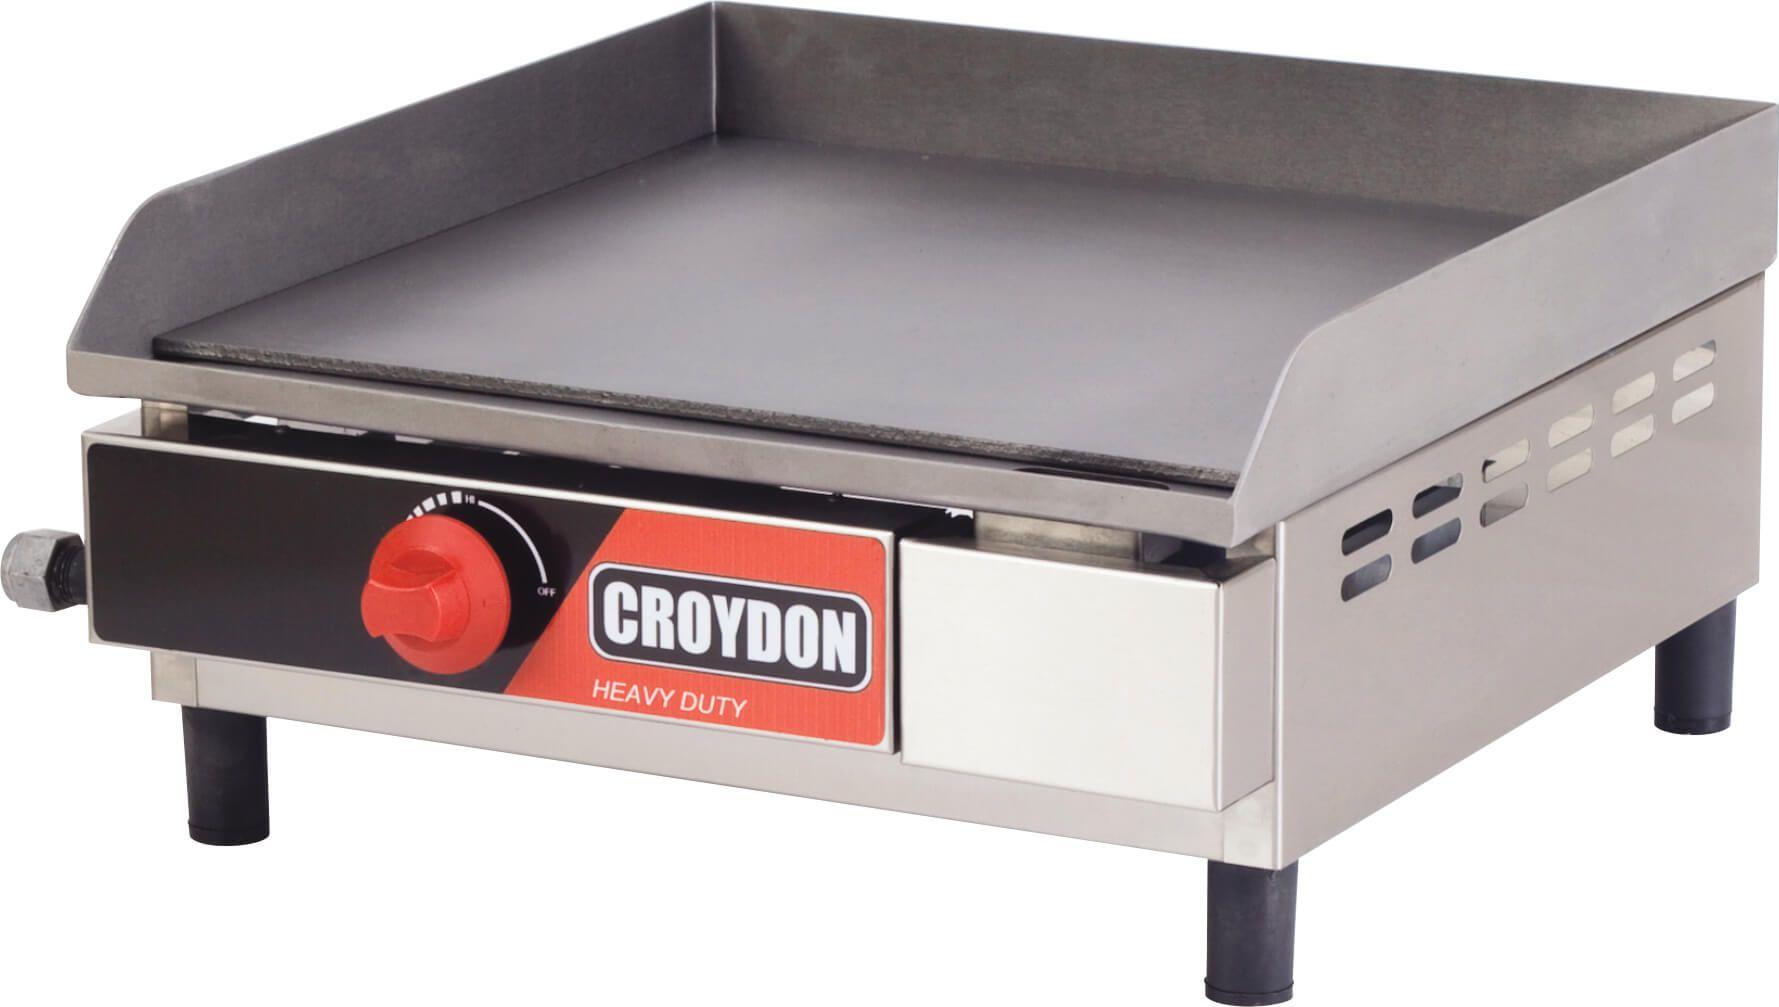 Chapa Churrasqueira a Gás 45 cm FG04 Croydon